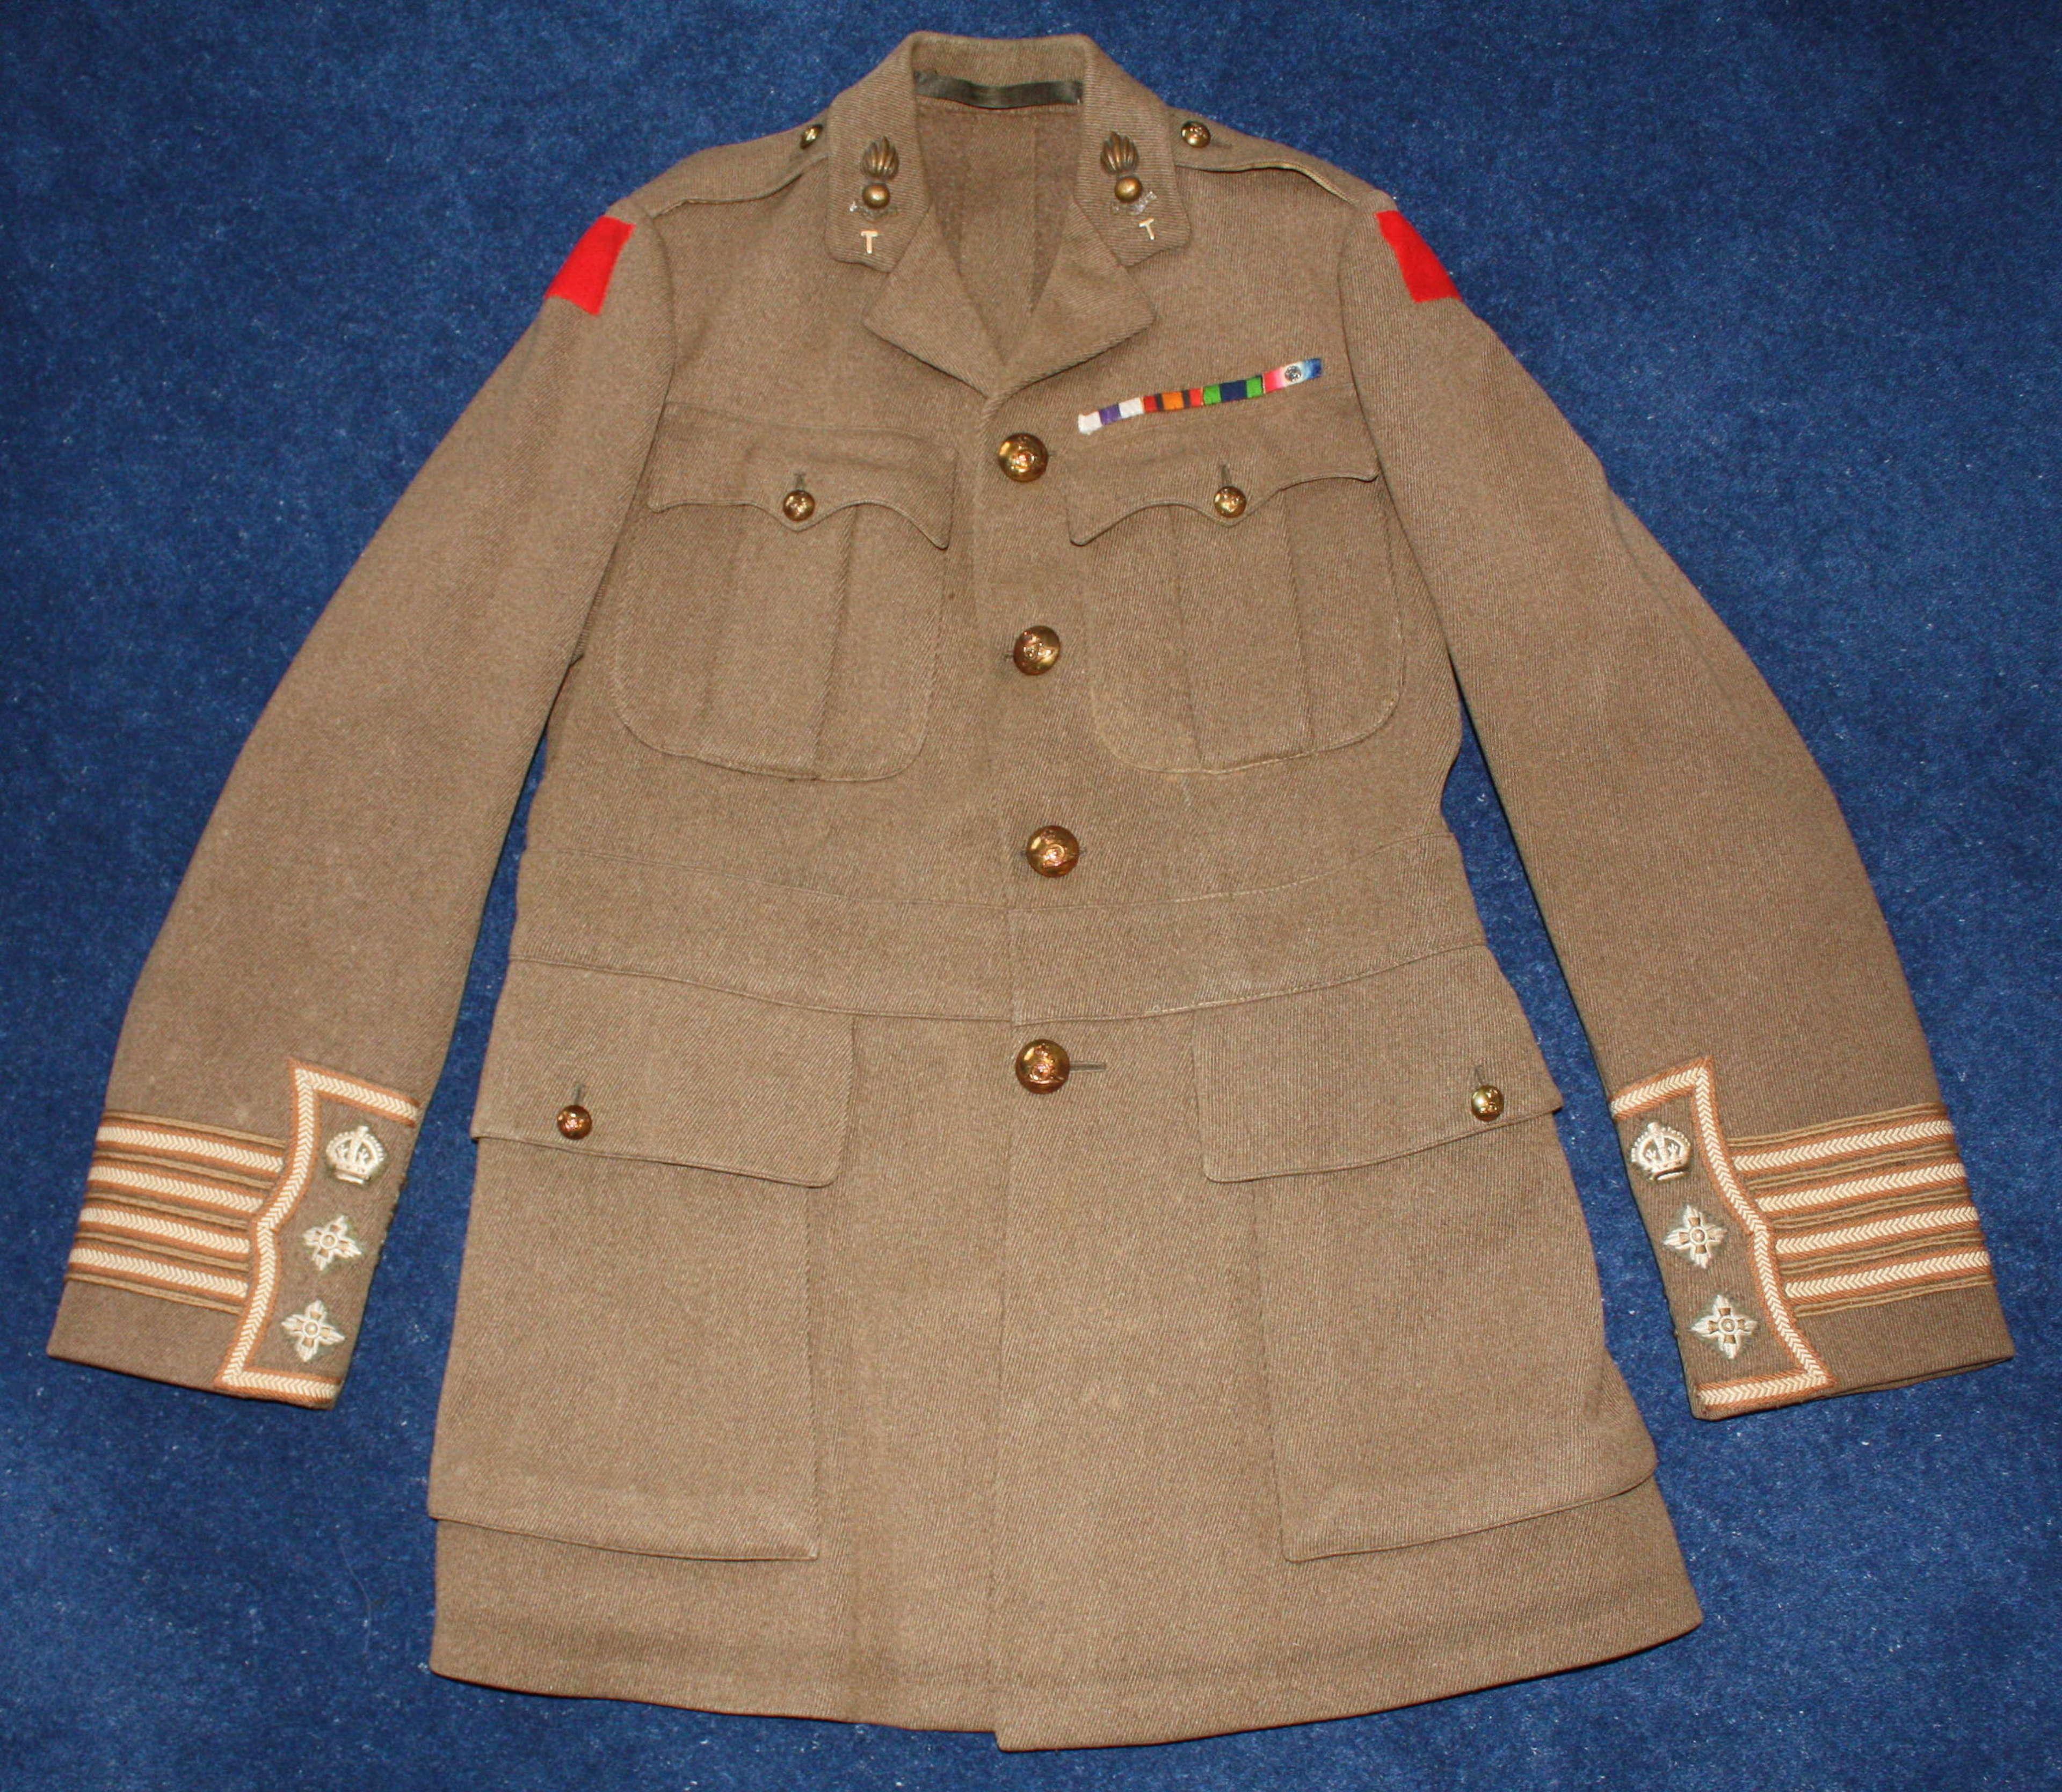 WW1 BRITISH ARMY CUFF RANK TUNIC TO ROYAL ARTILLERY FULL COLONEL